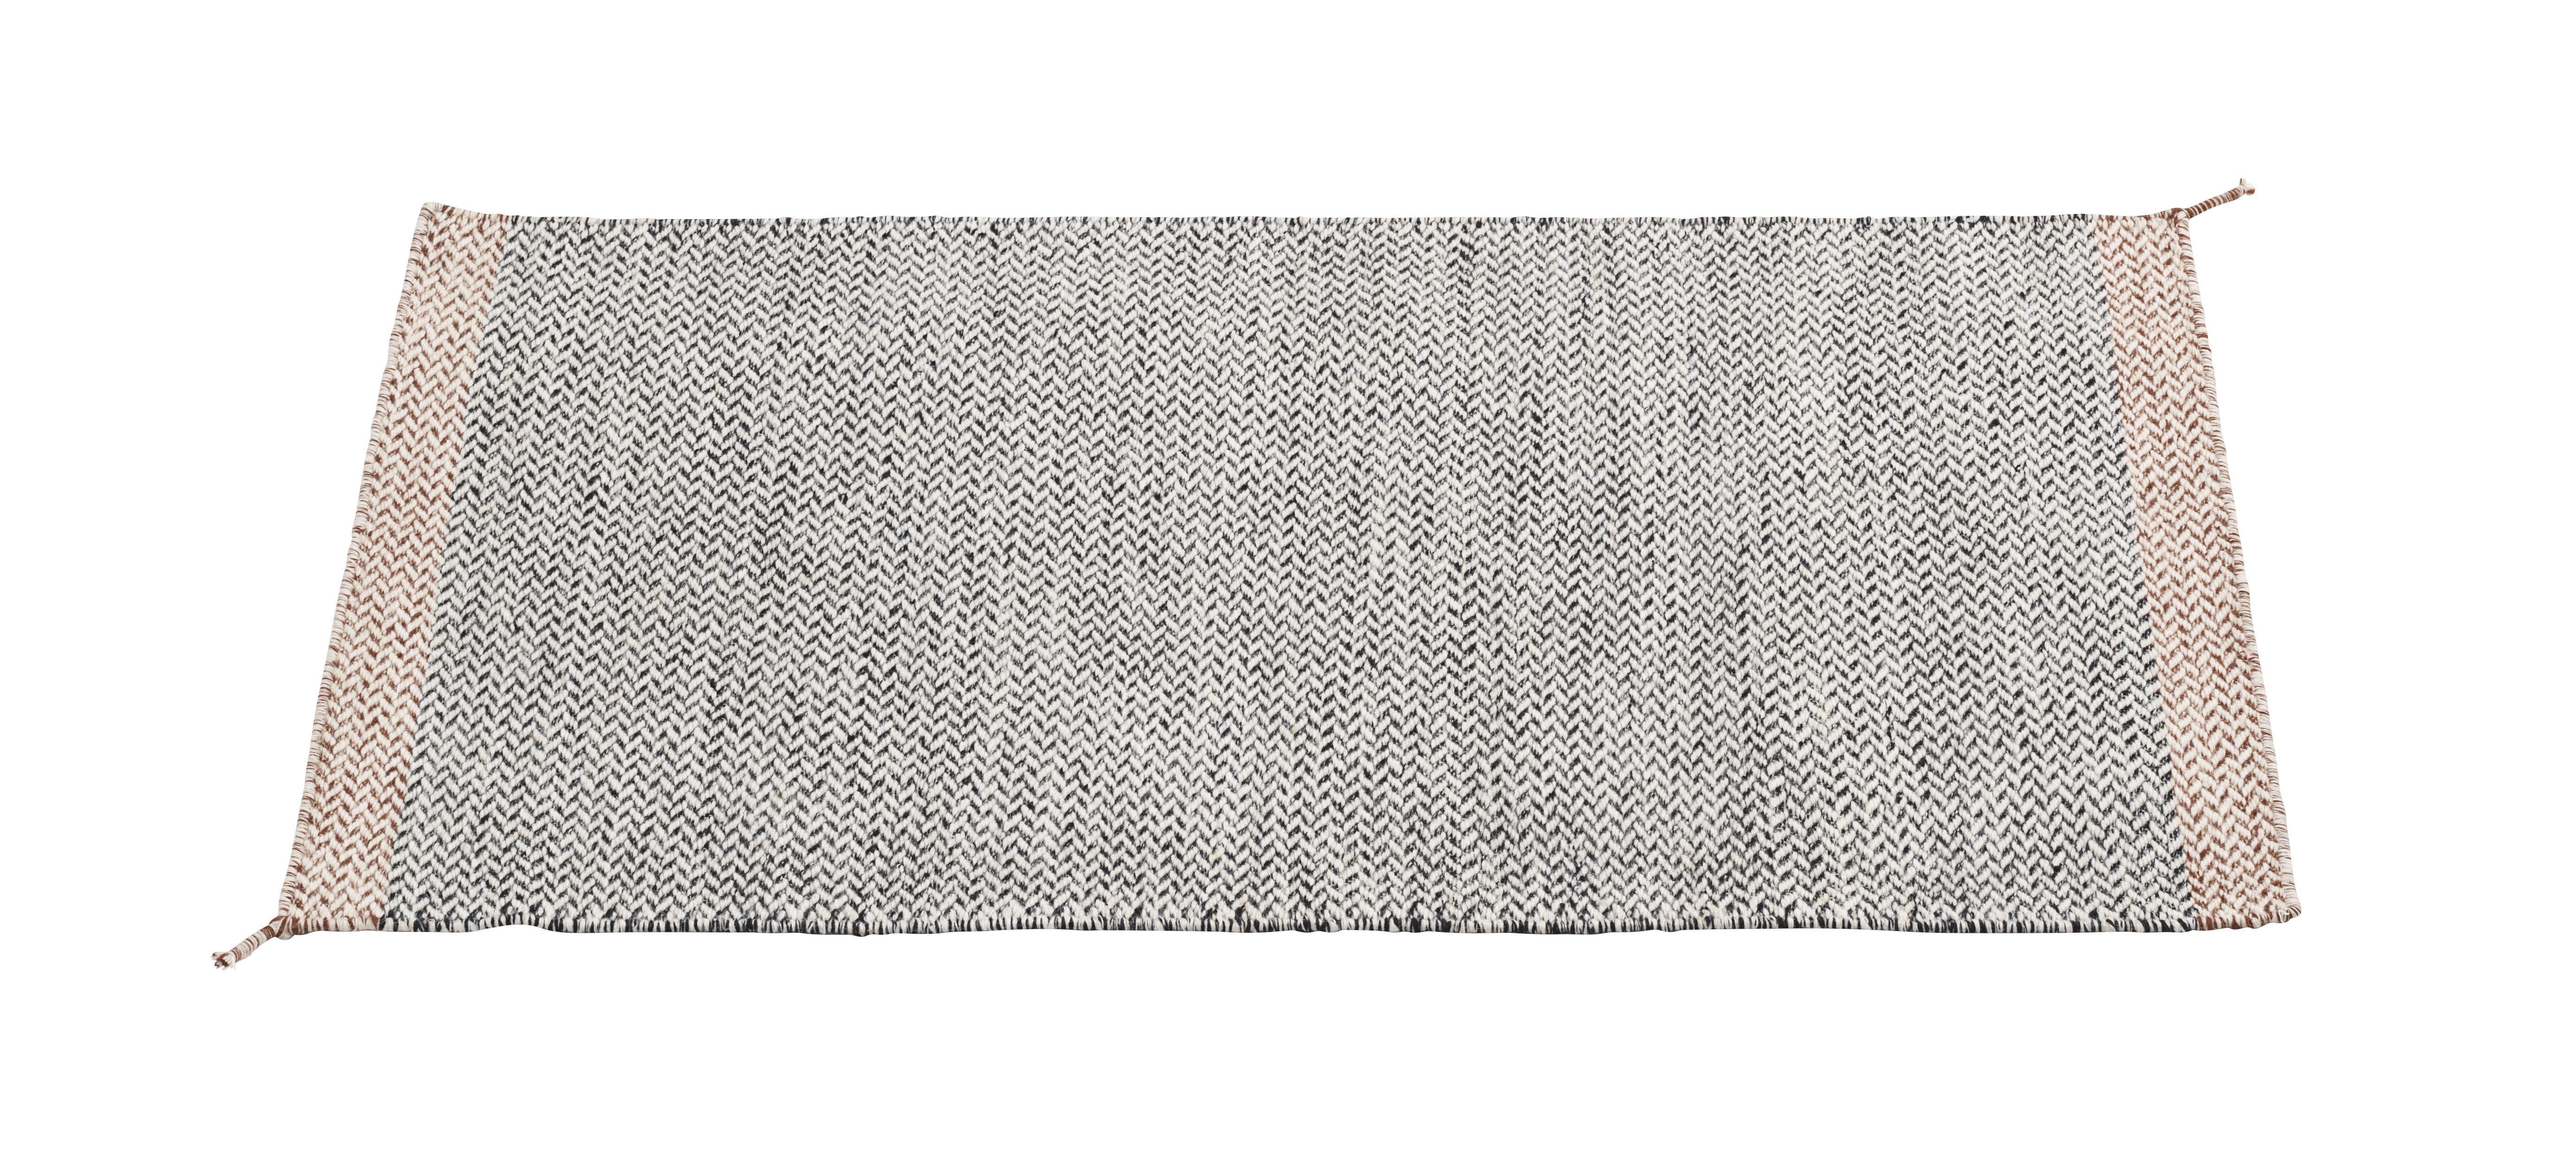 Interni - Tappeti - Tappeto PLY / 85 x 140 cm - Tessuto a mano - Muuto - Noir & blanc - Lana